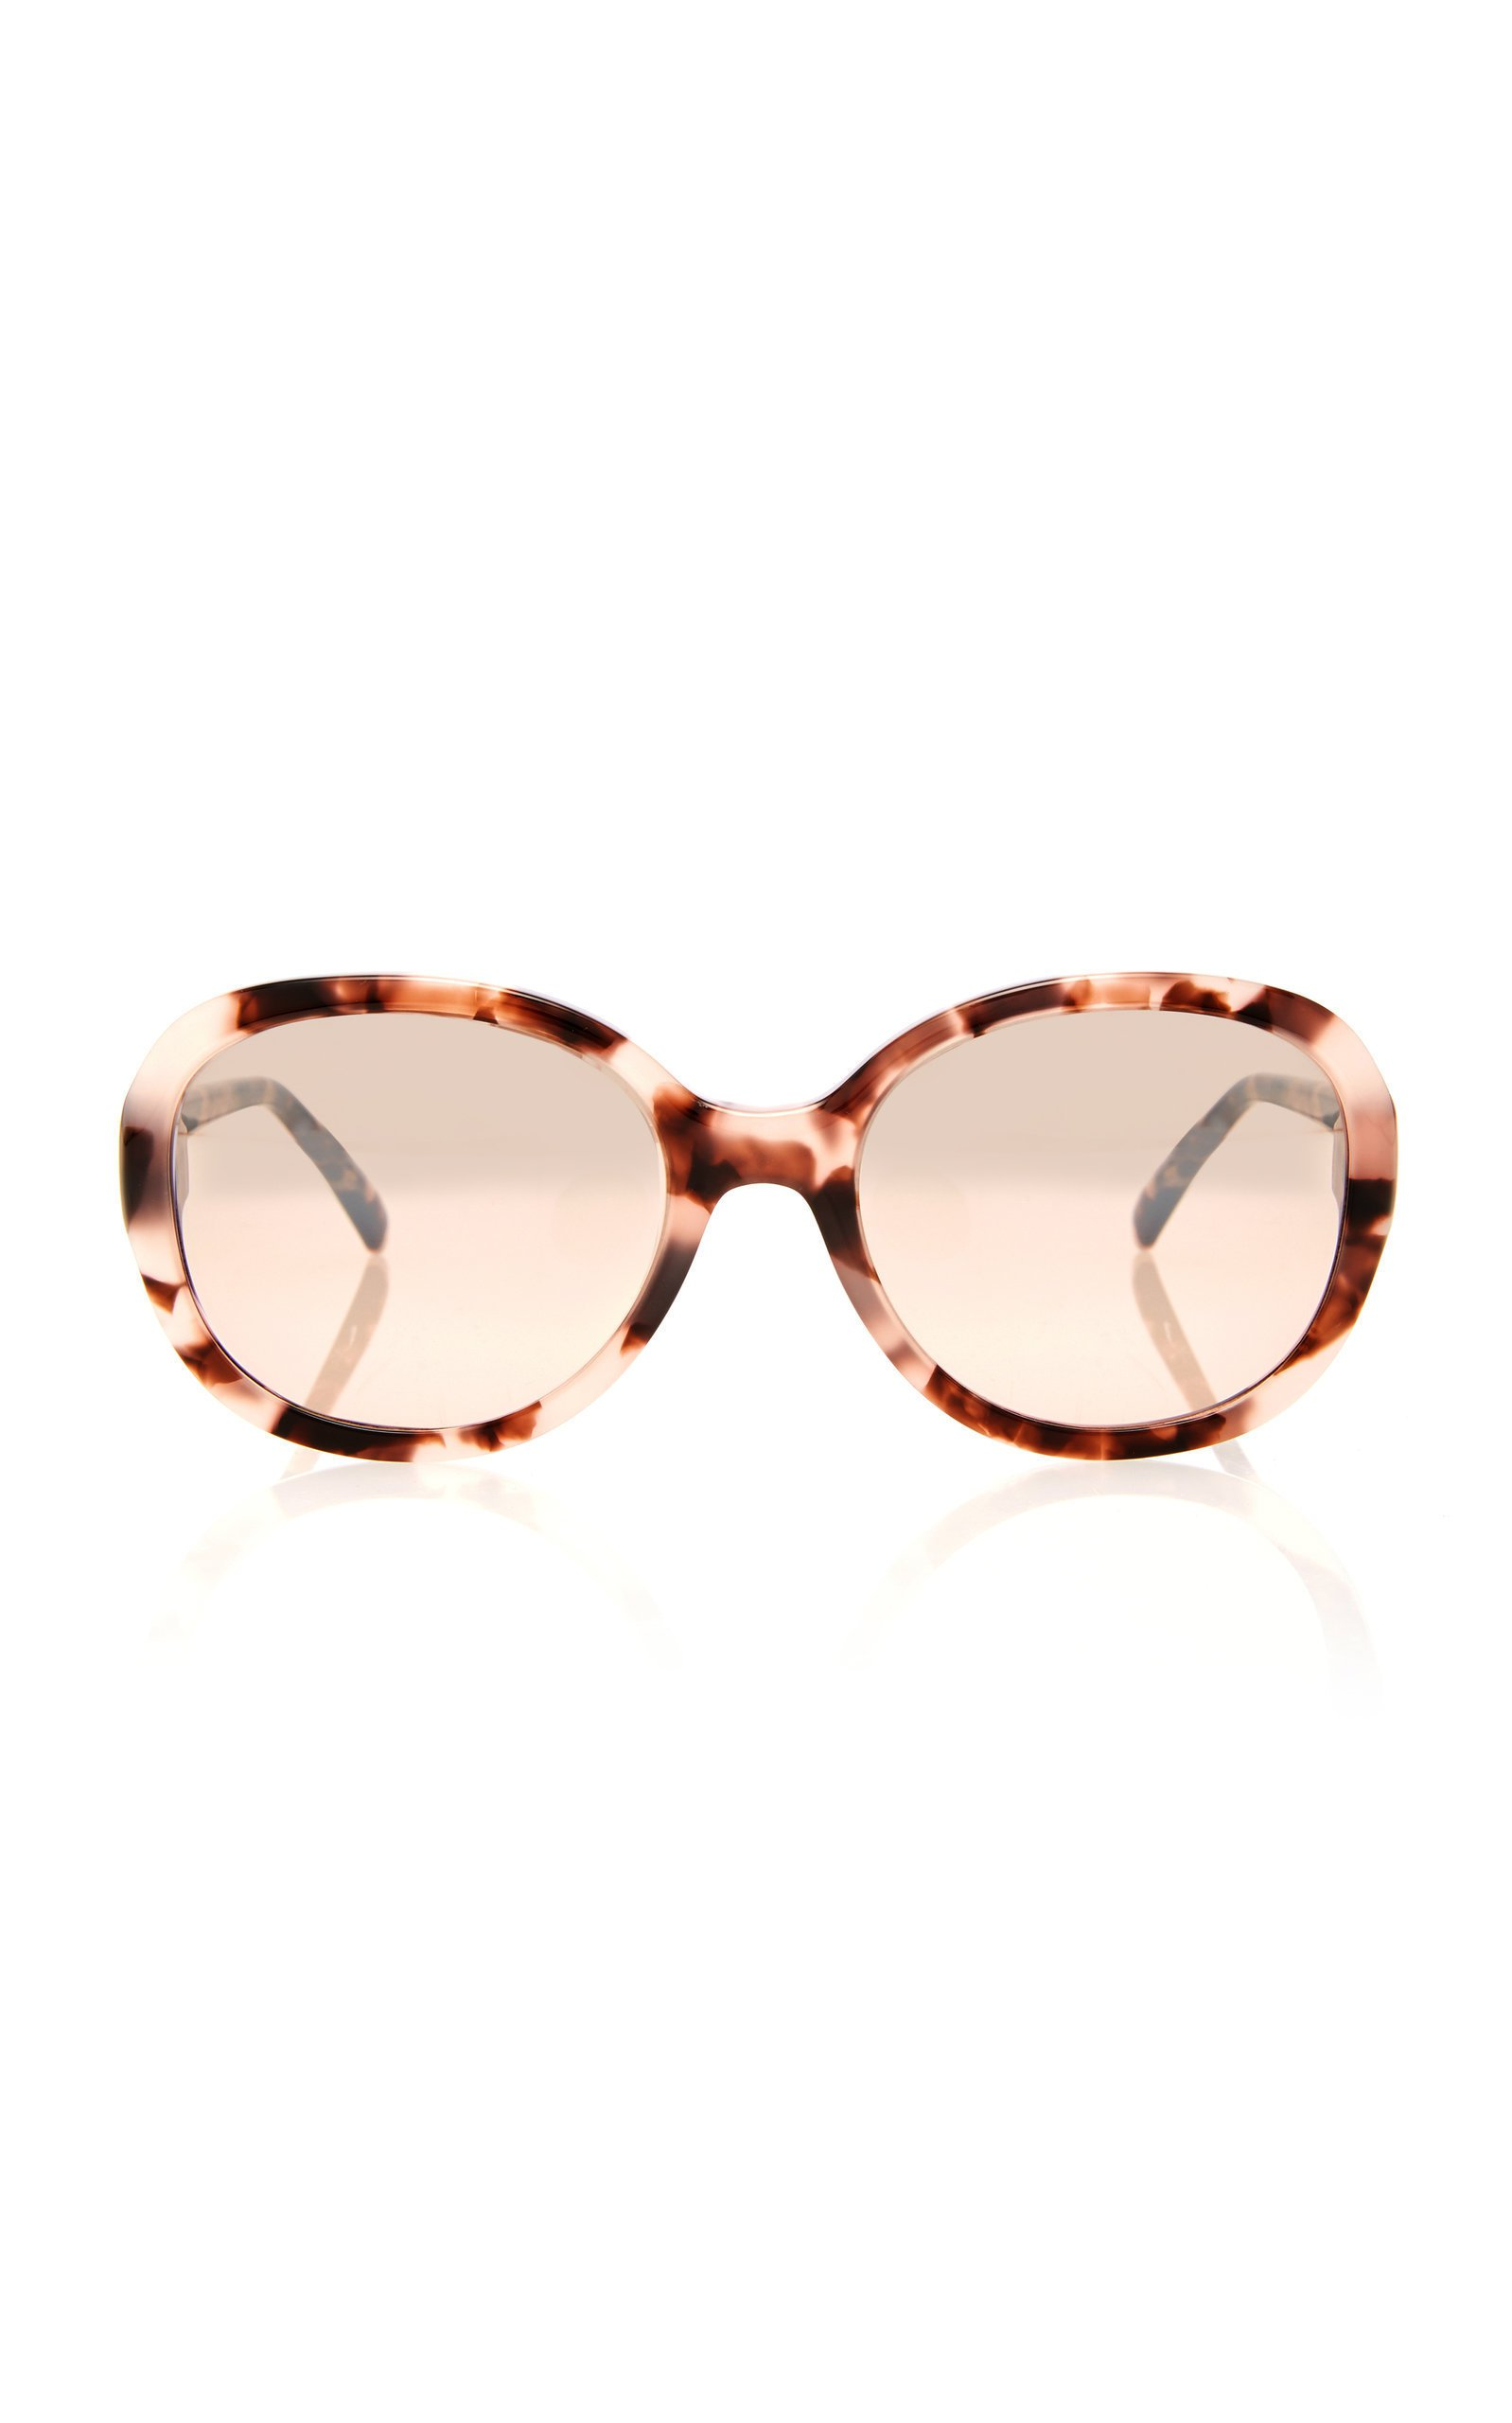 Givenchy Sunglasses Tortoiseshell Acetate Round-Frame Sunglasses